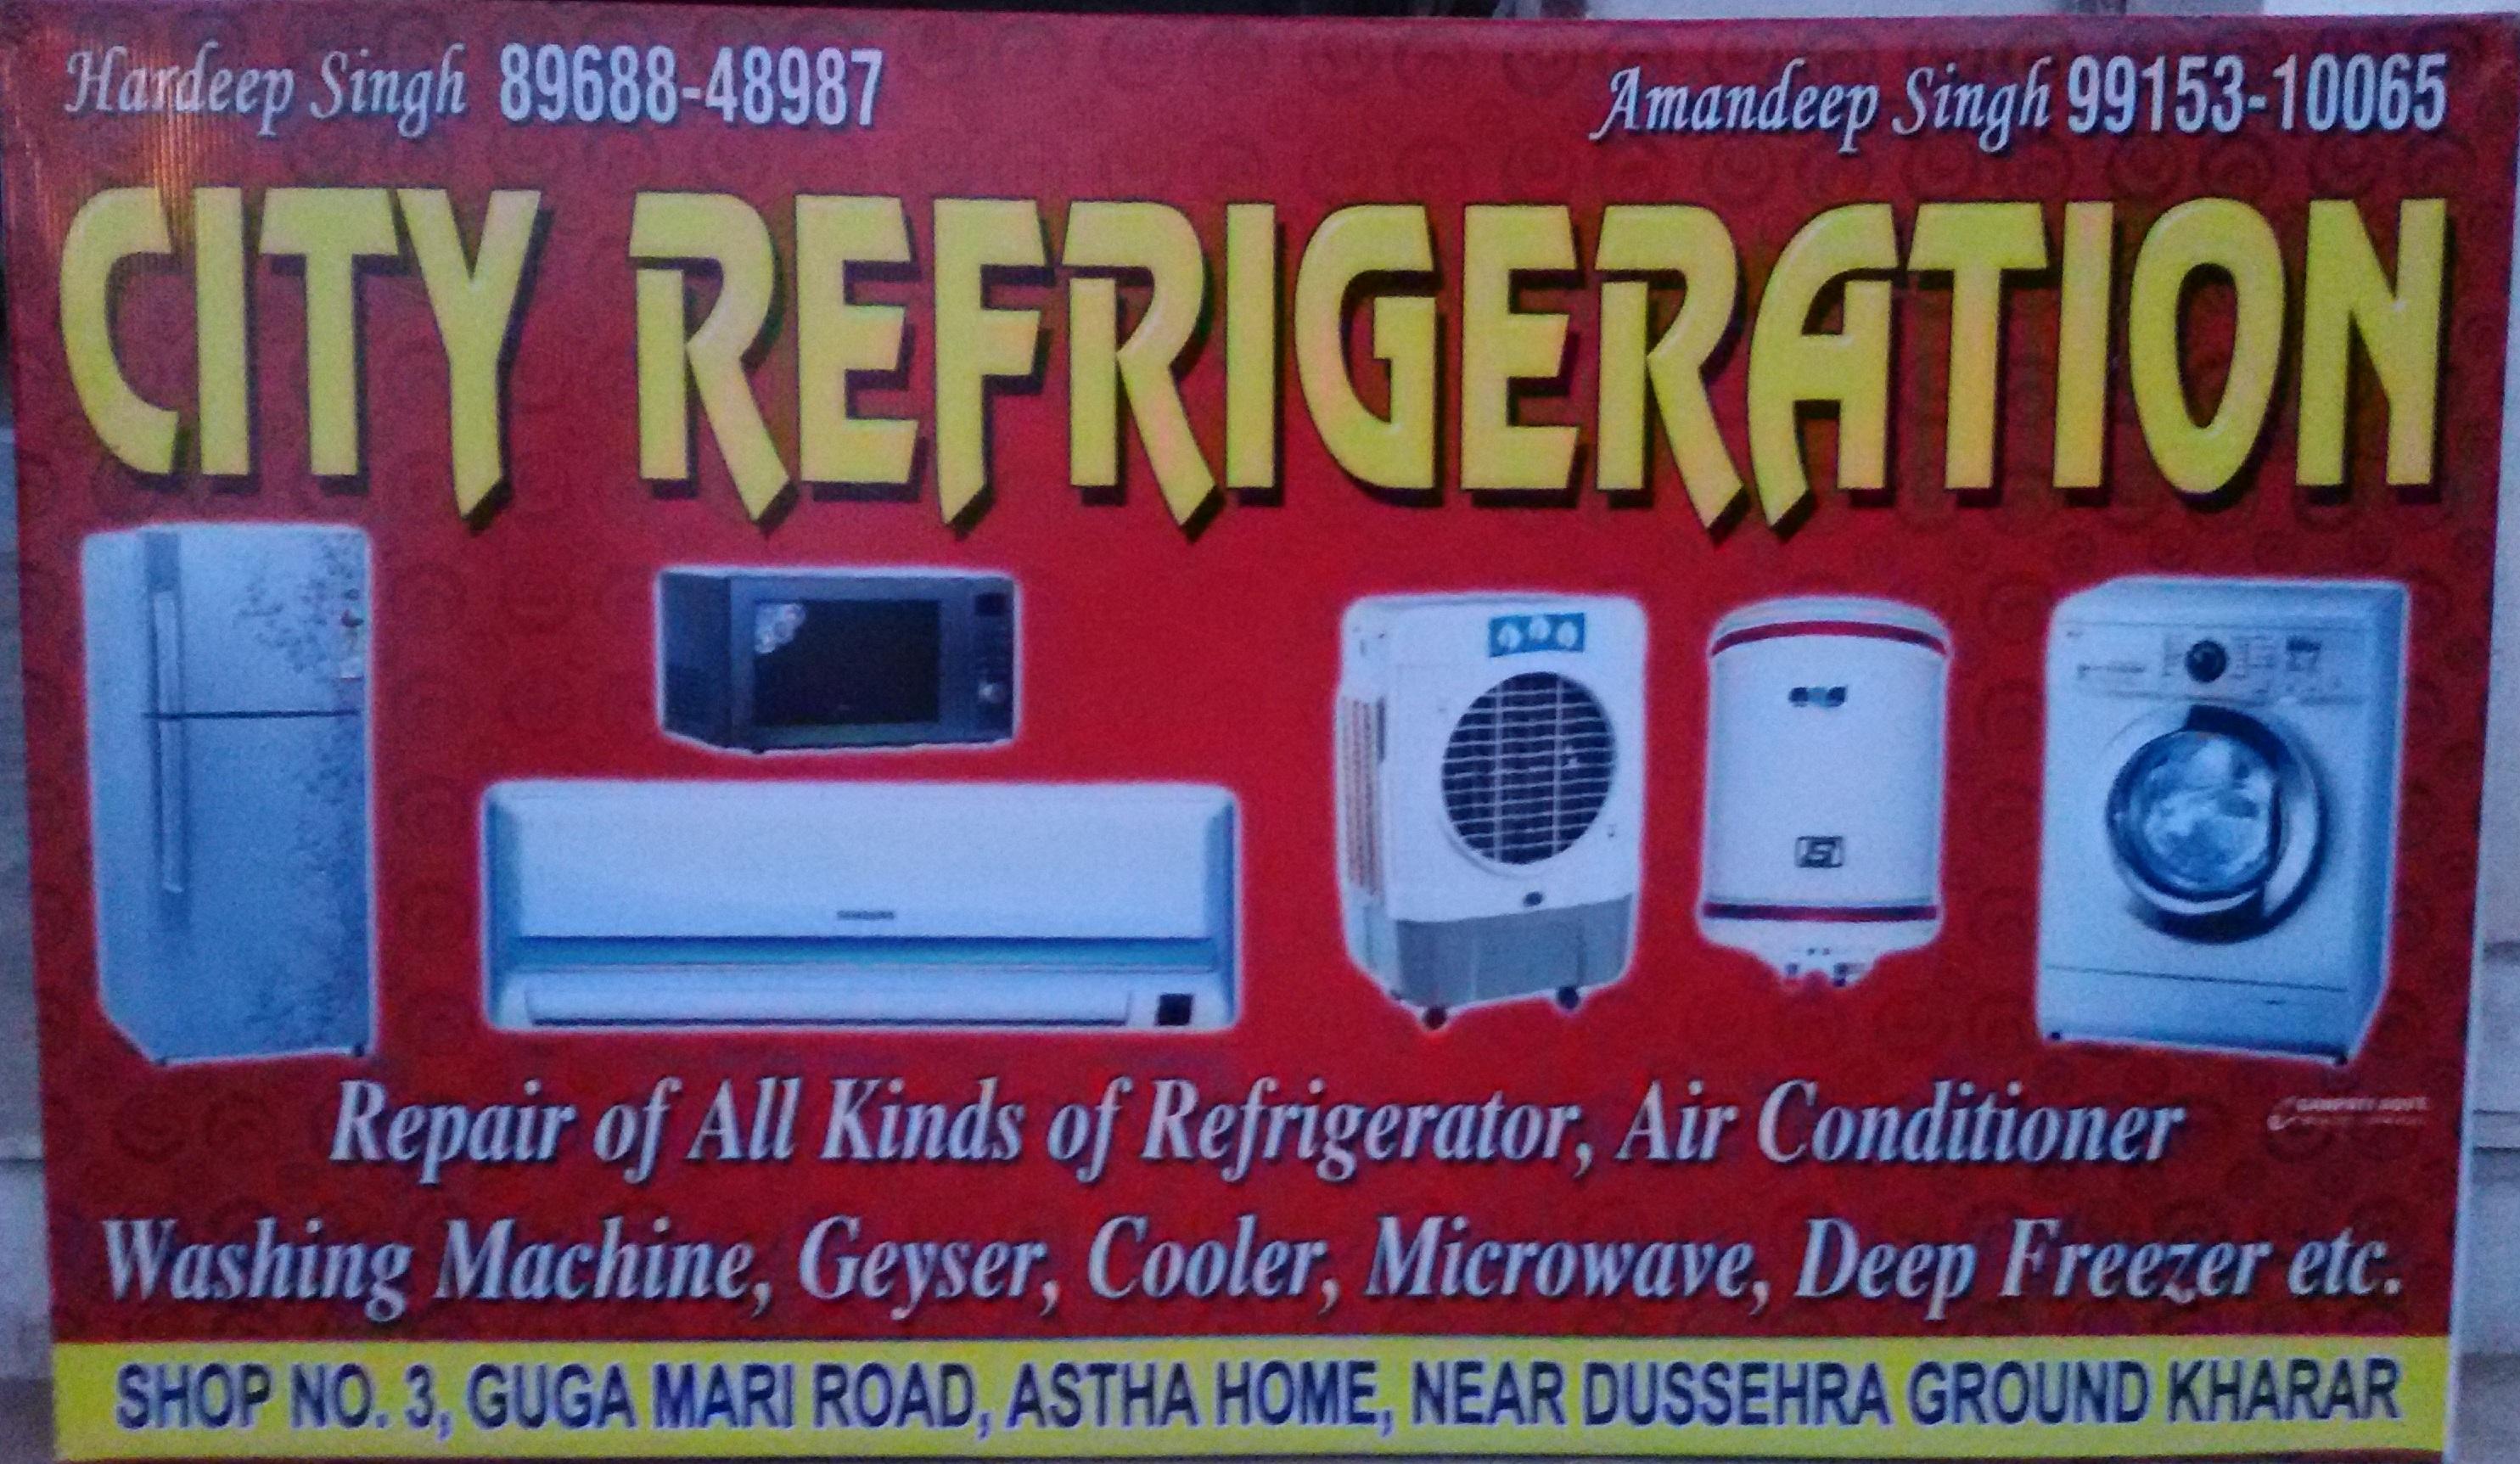 City Refrigeration